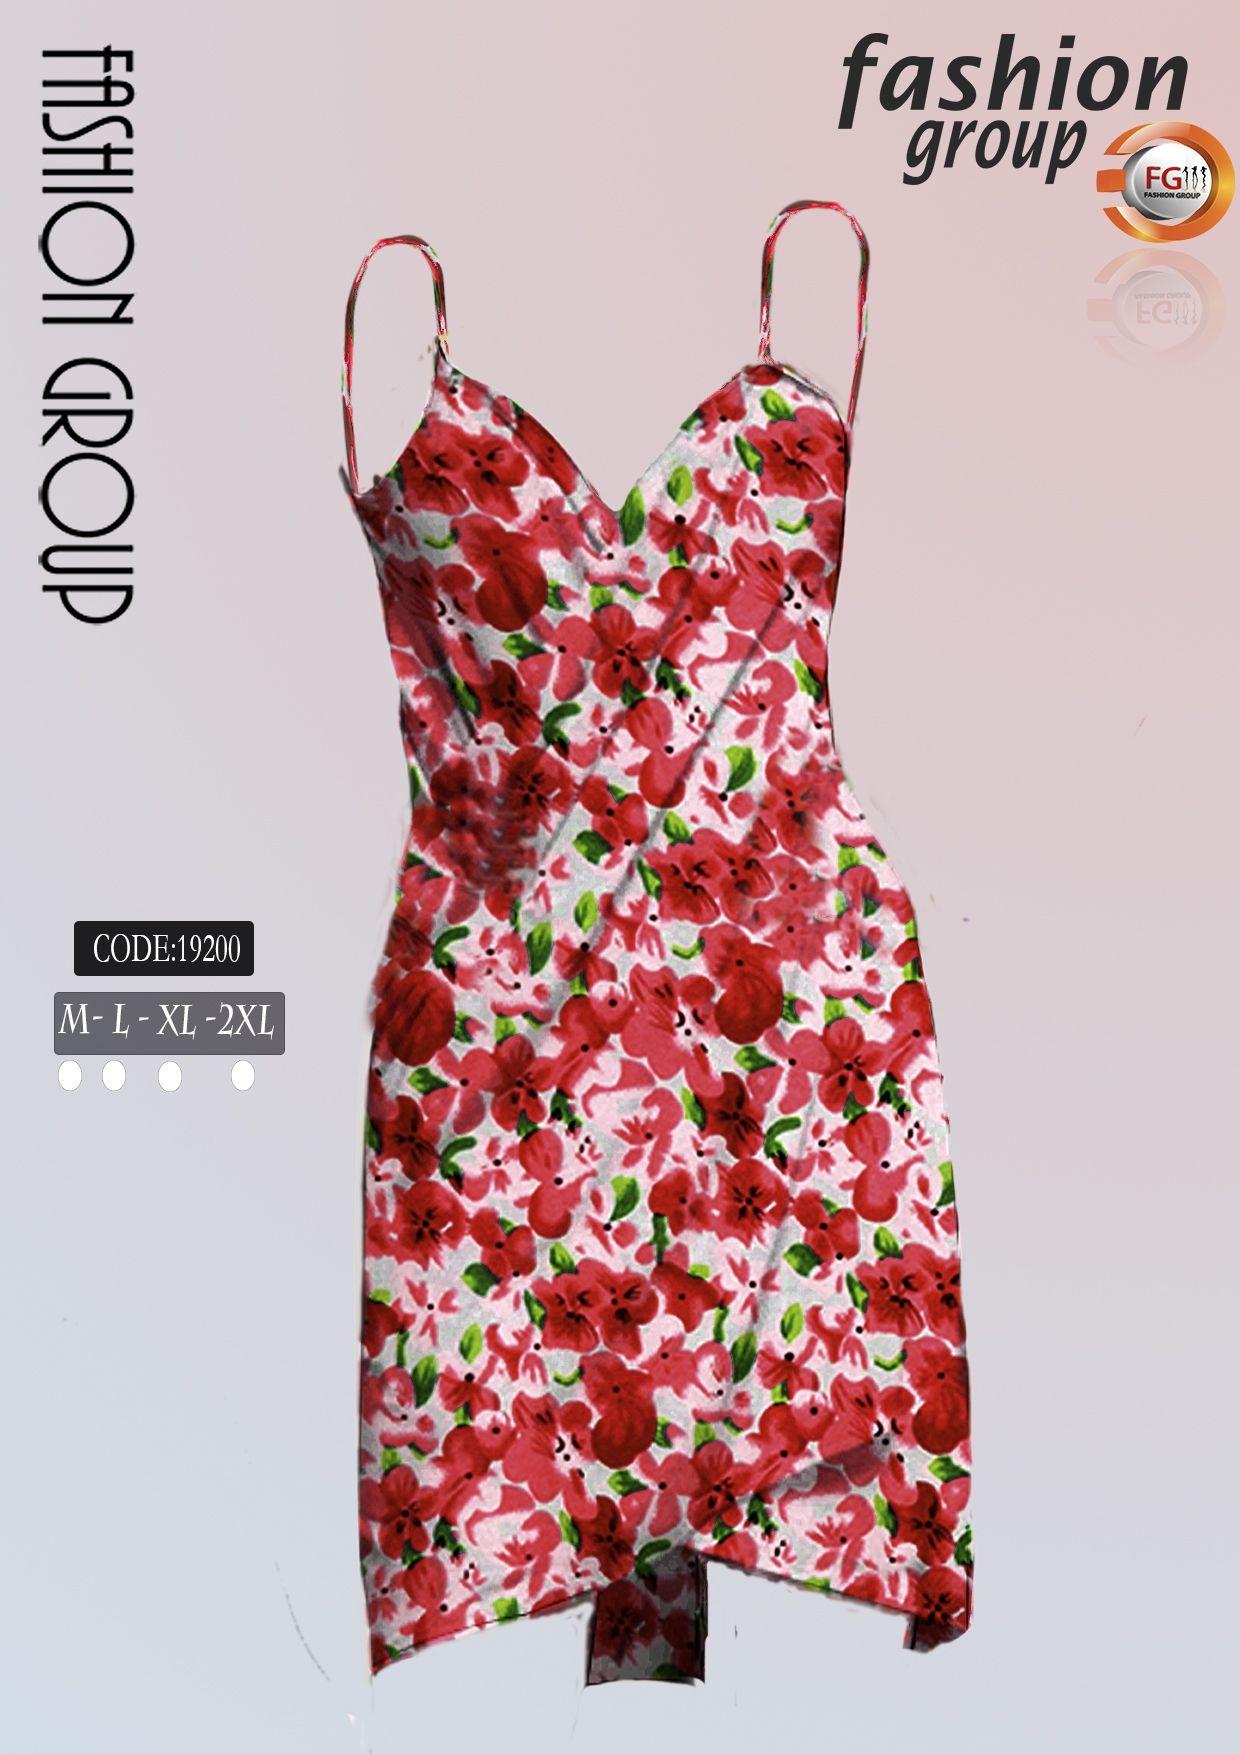 FashionGroup Greek Goddess Spaghetti Strap Sarong Beachwear - Red